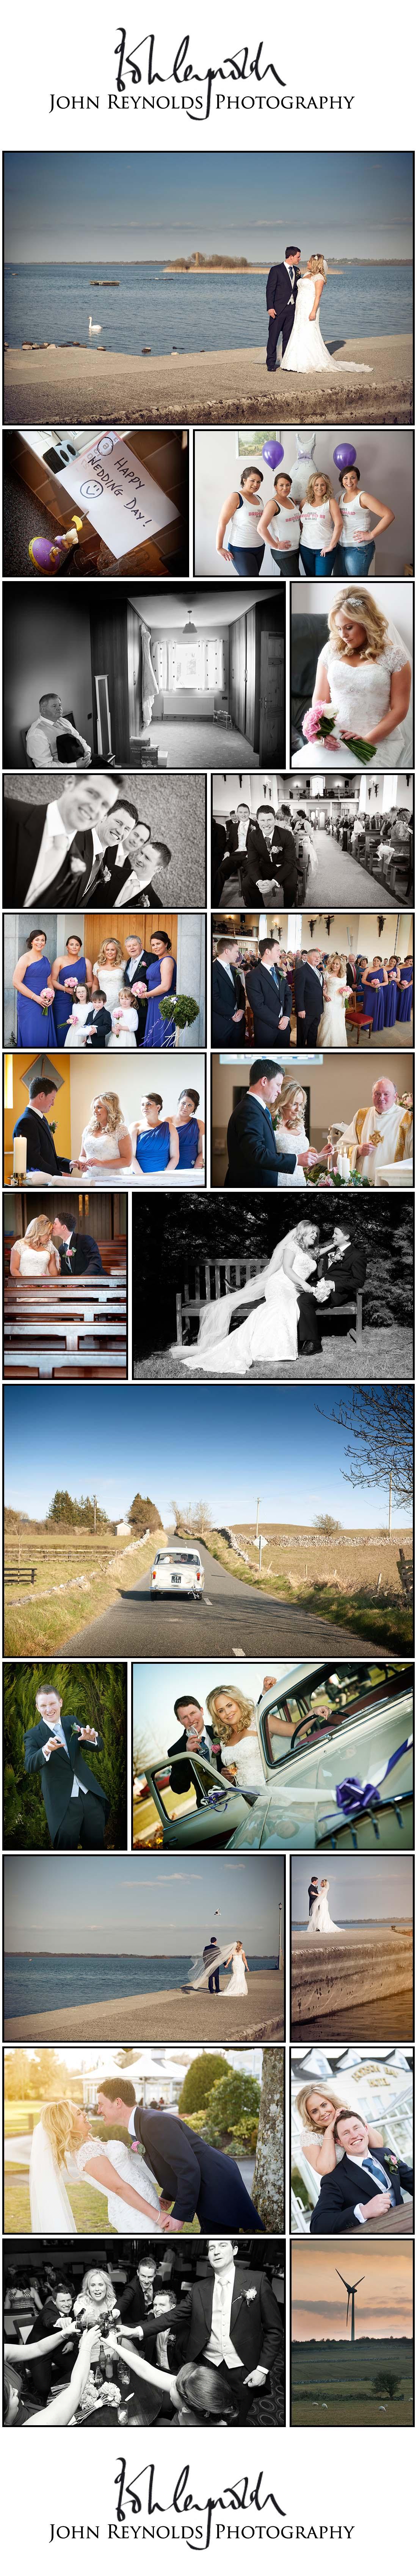 Imelda & John Blog Collage